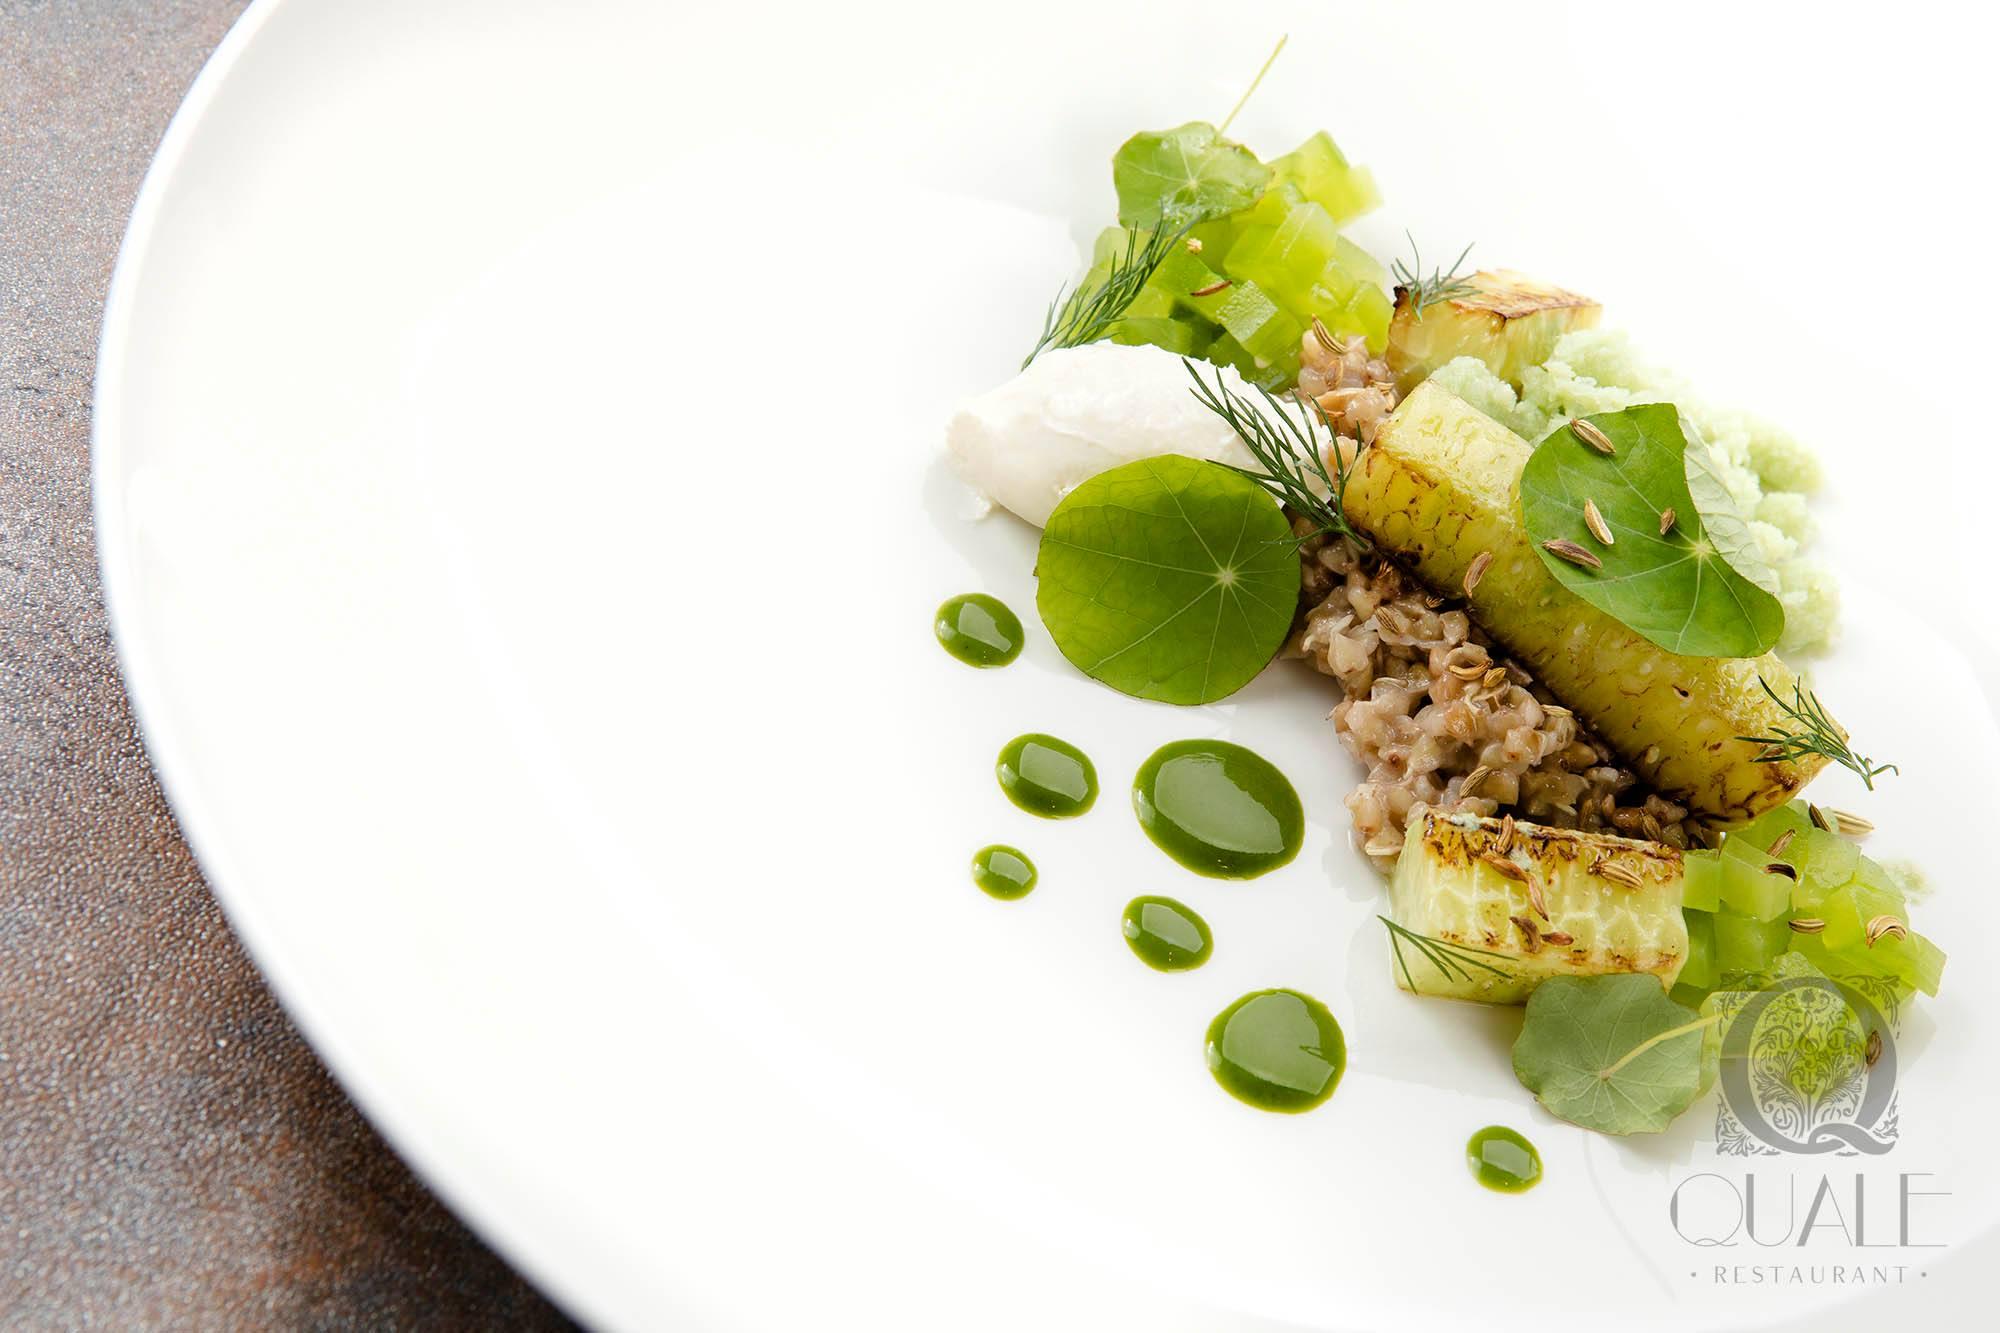 Fot: Quale Restaurant